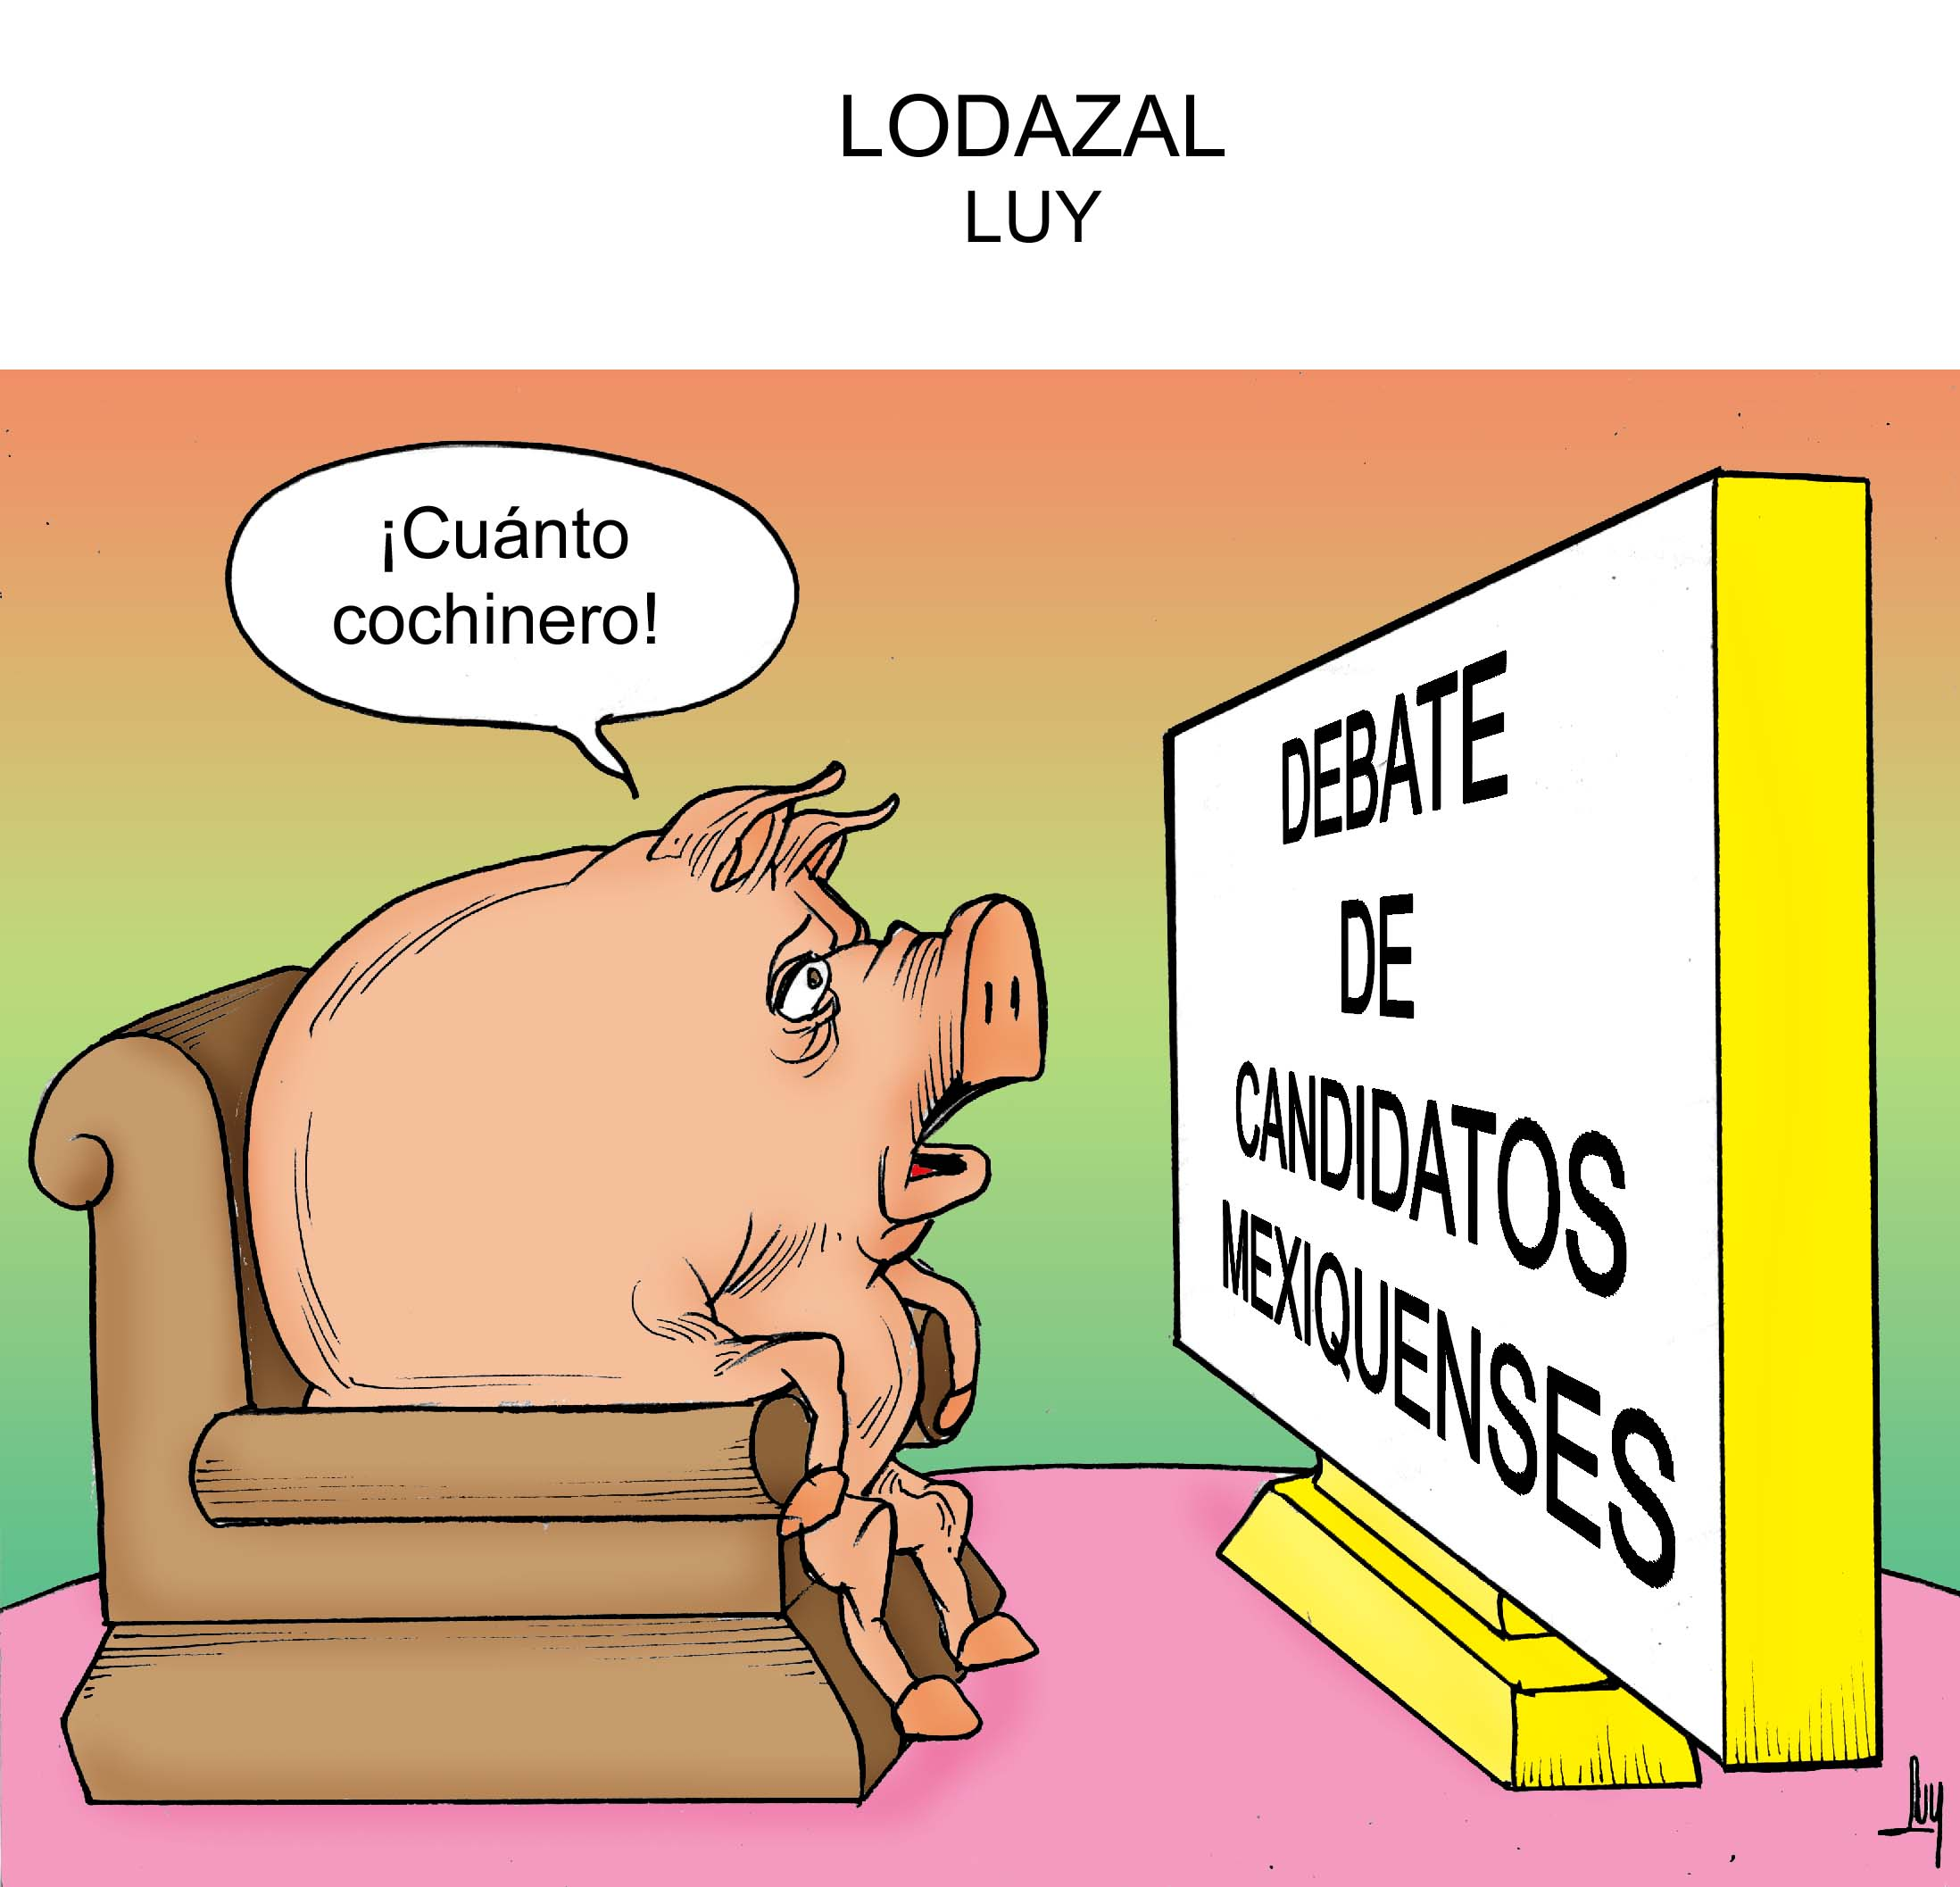 lodazal